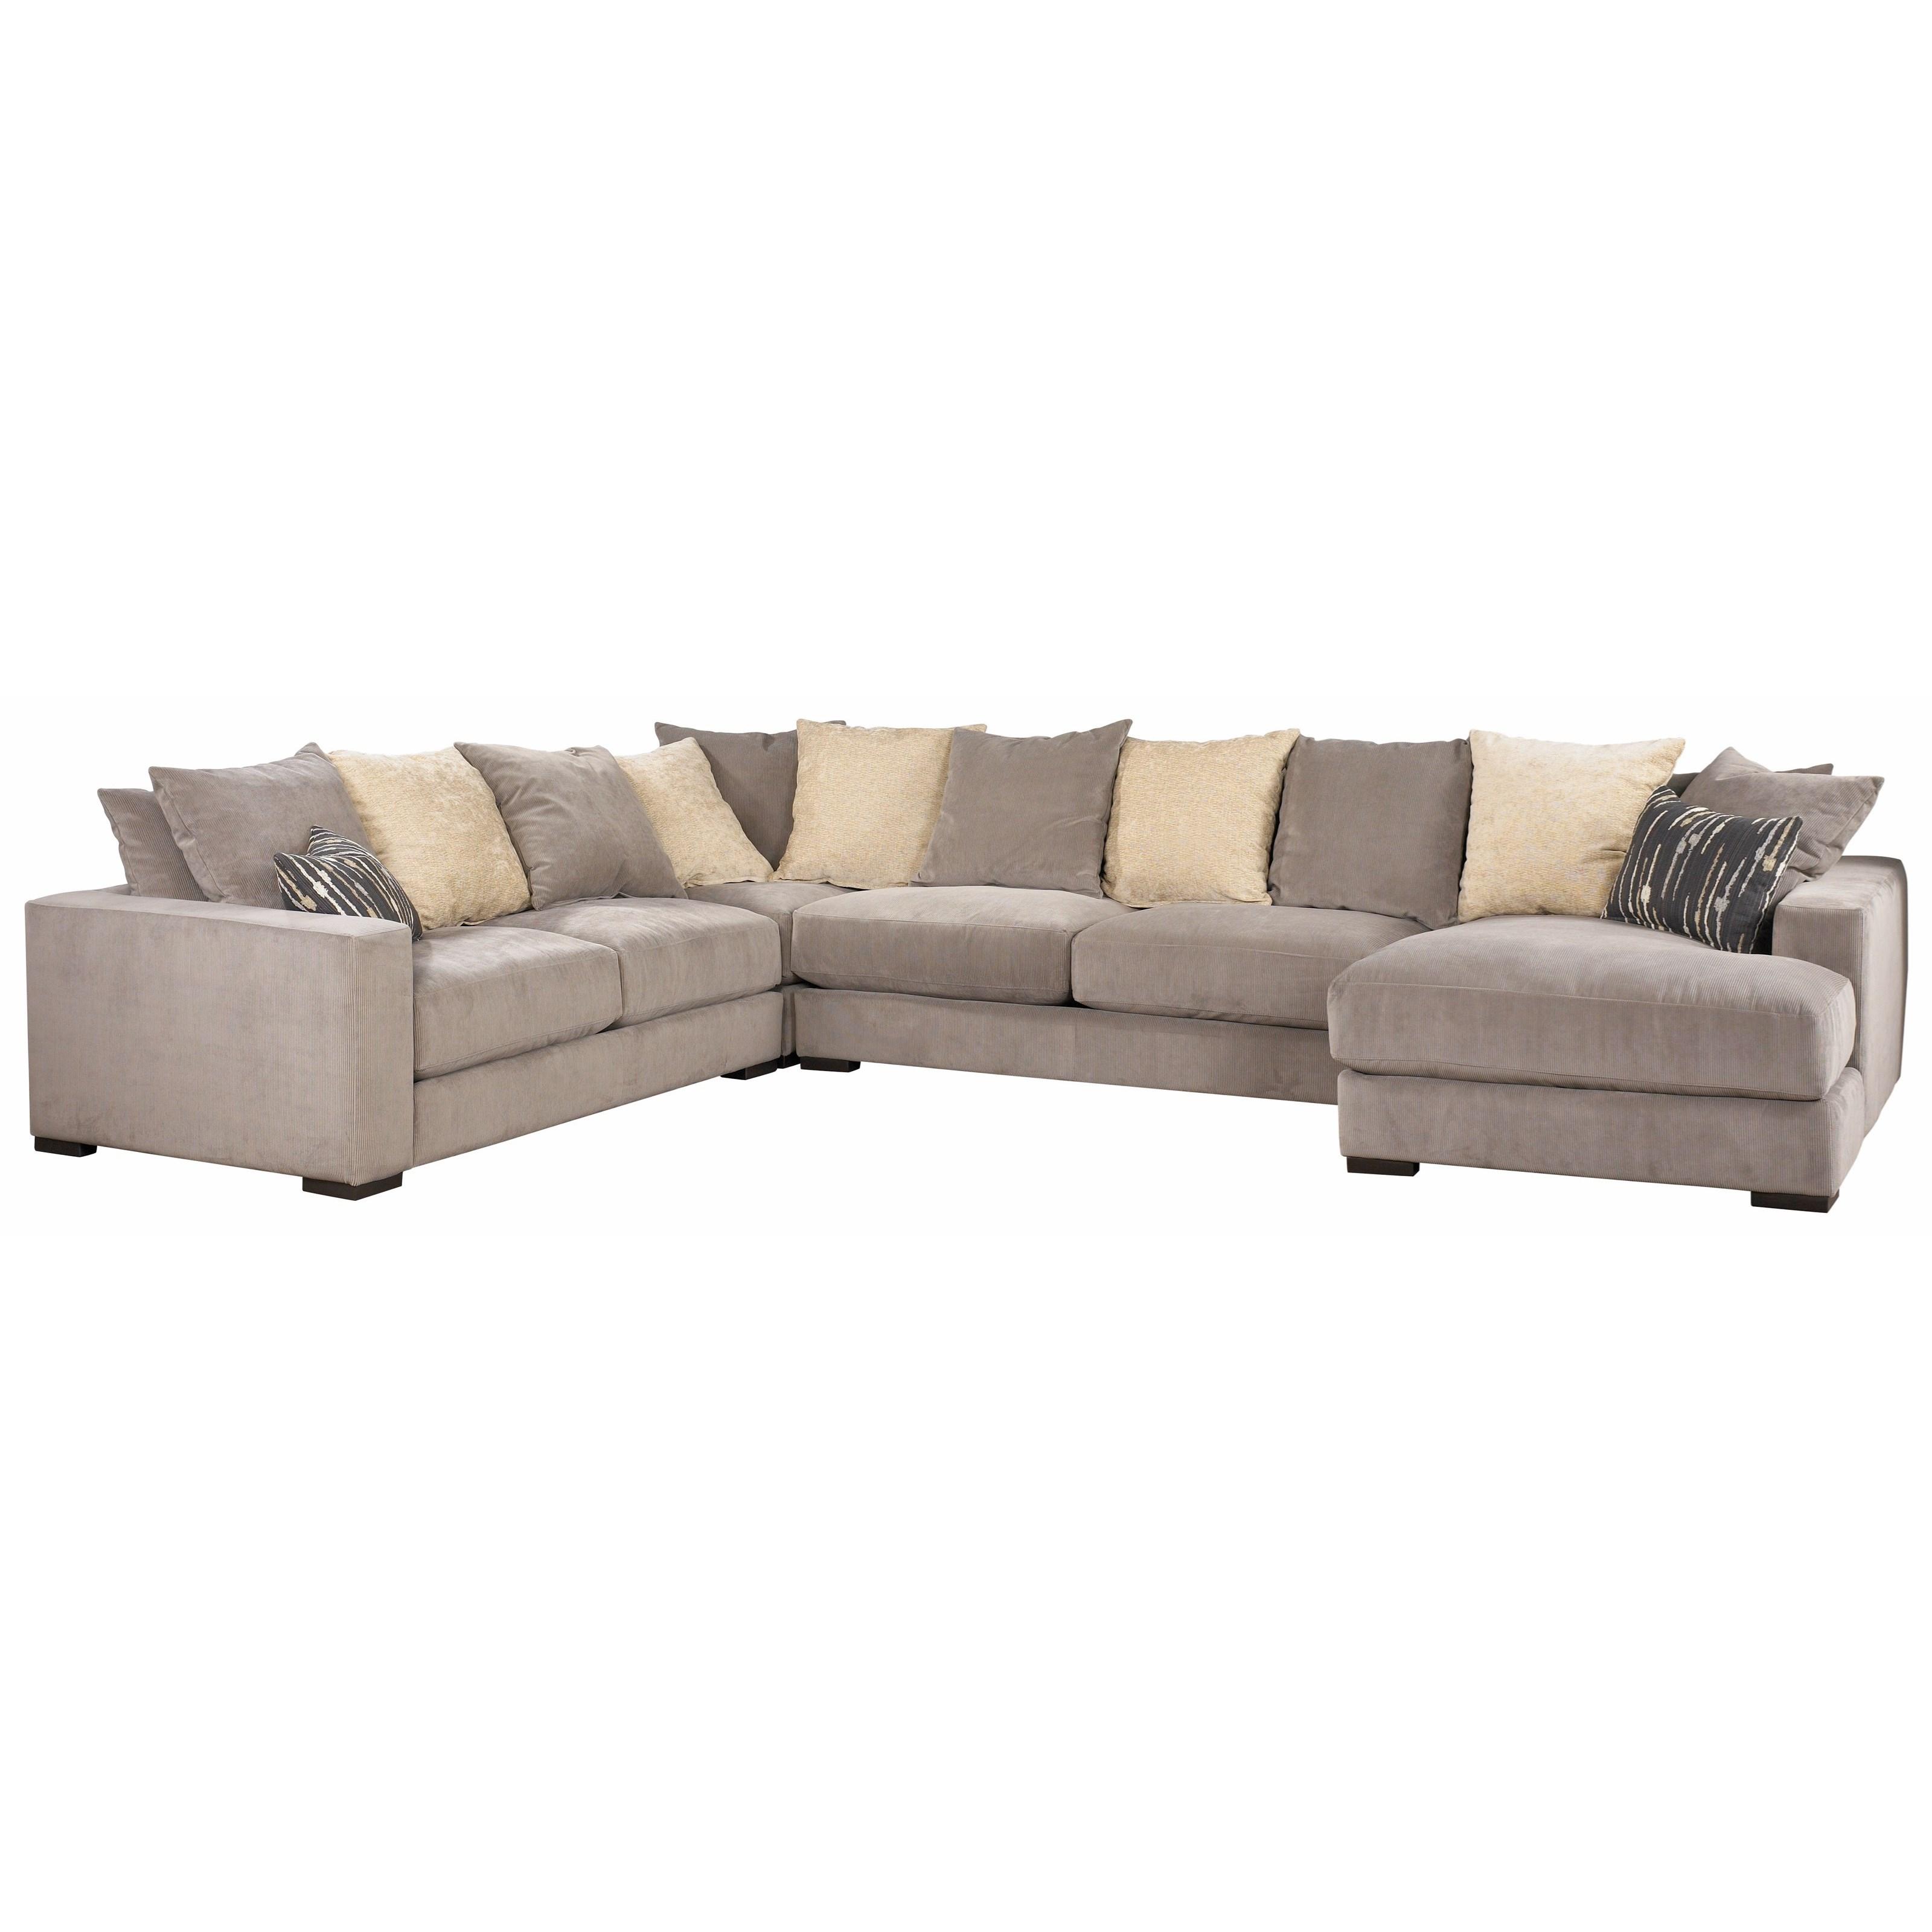 Jonathan Louis LombardySectional Sofa